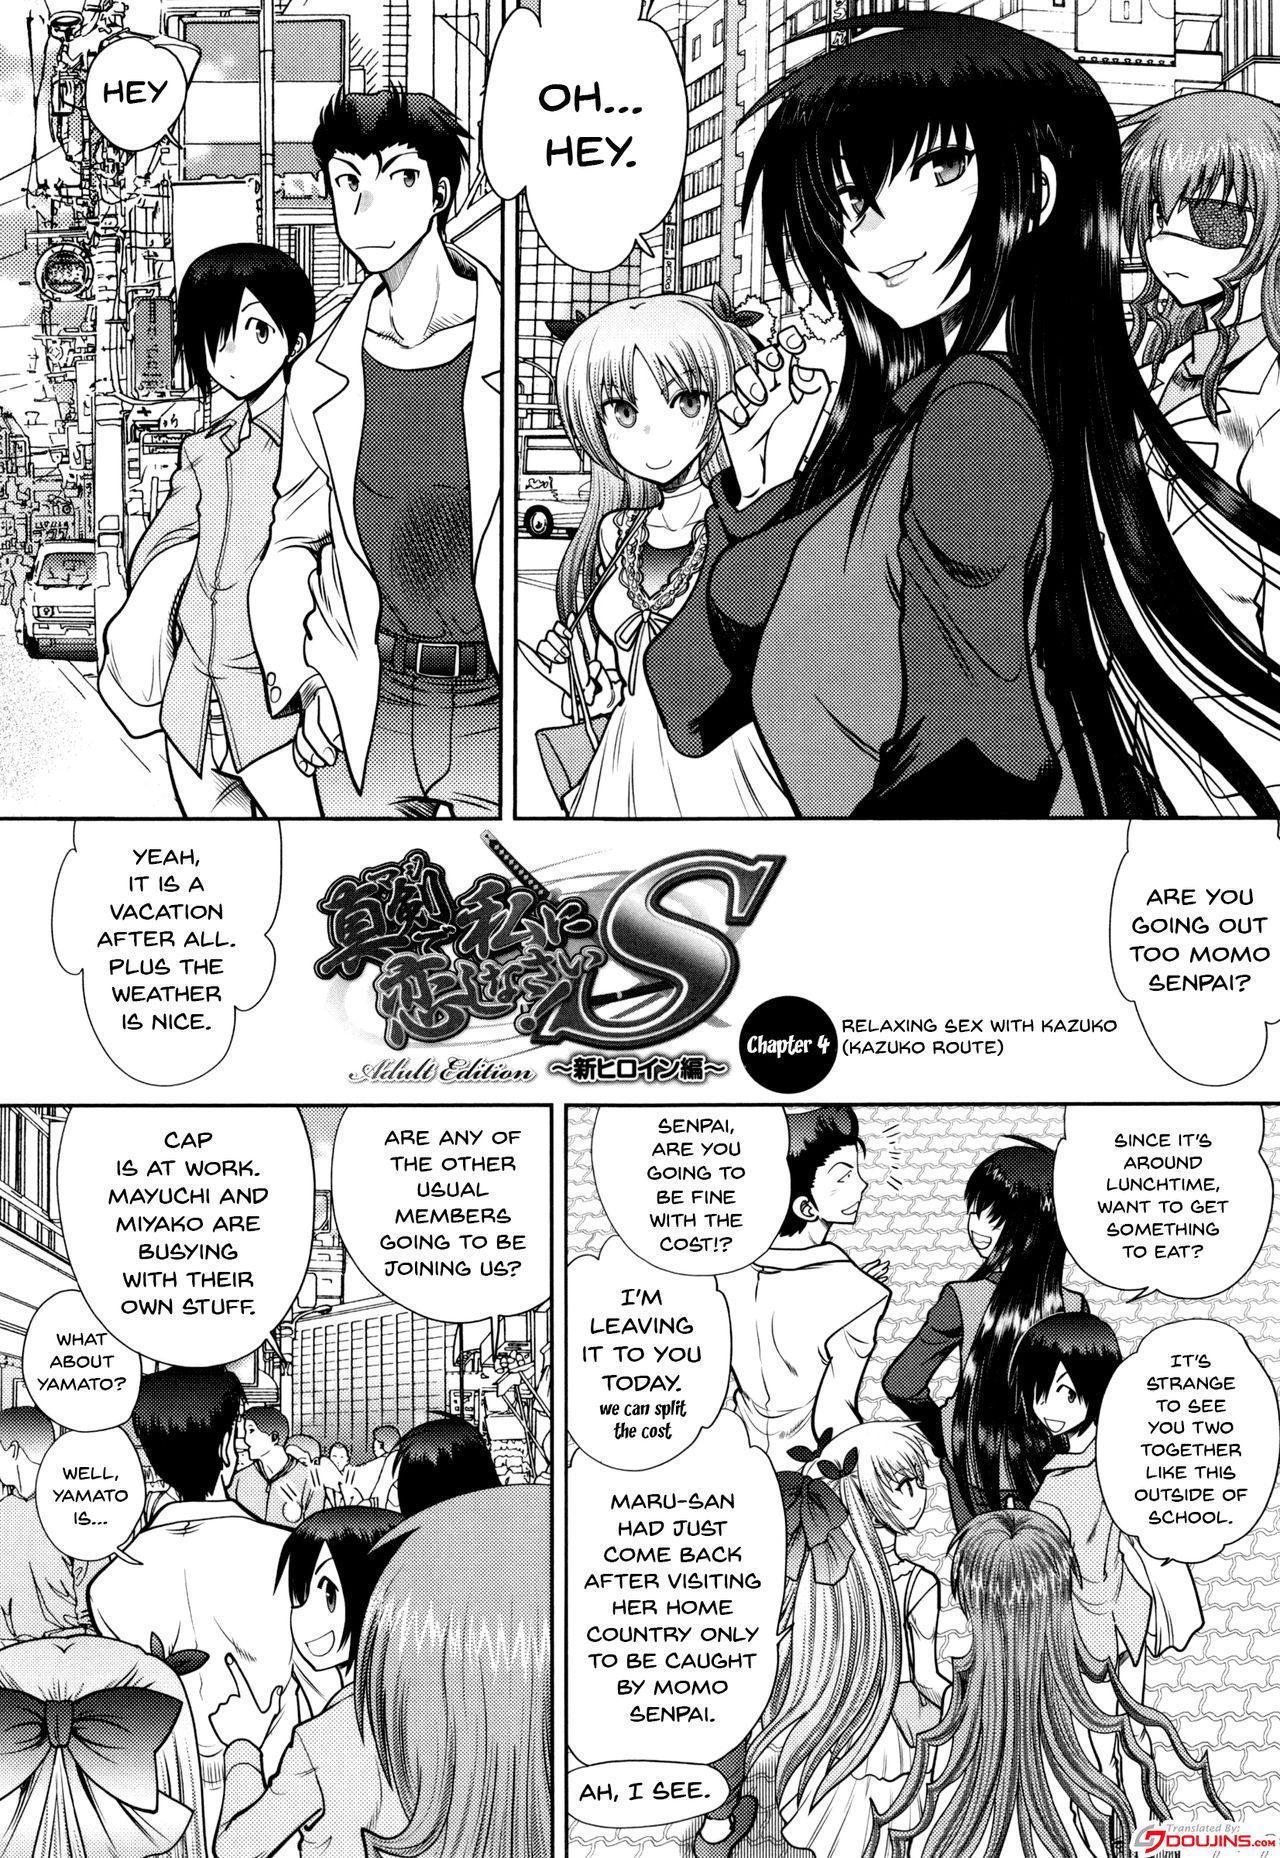 [Yagami Dai] Maji de Watashi ni Koi Shinasai! S Adult Edition ~Shodai Heroine Hen~ | Fall in Love With Me For Real! Ch.1-6 [English] {Doujins.com} 65